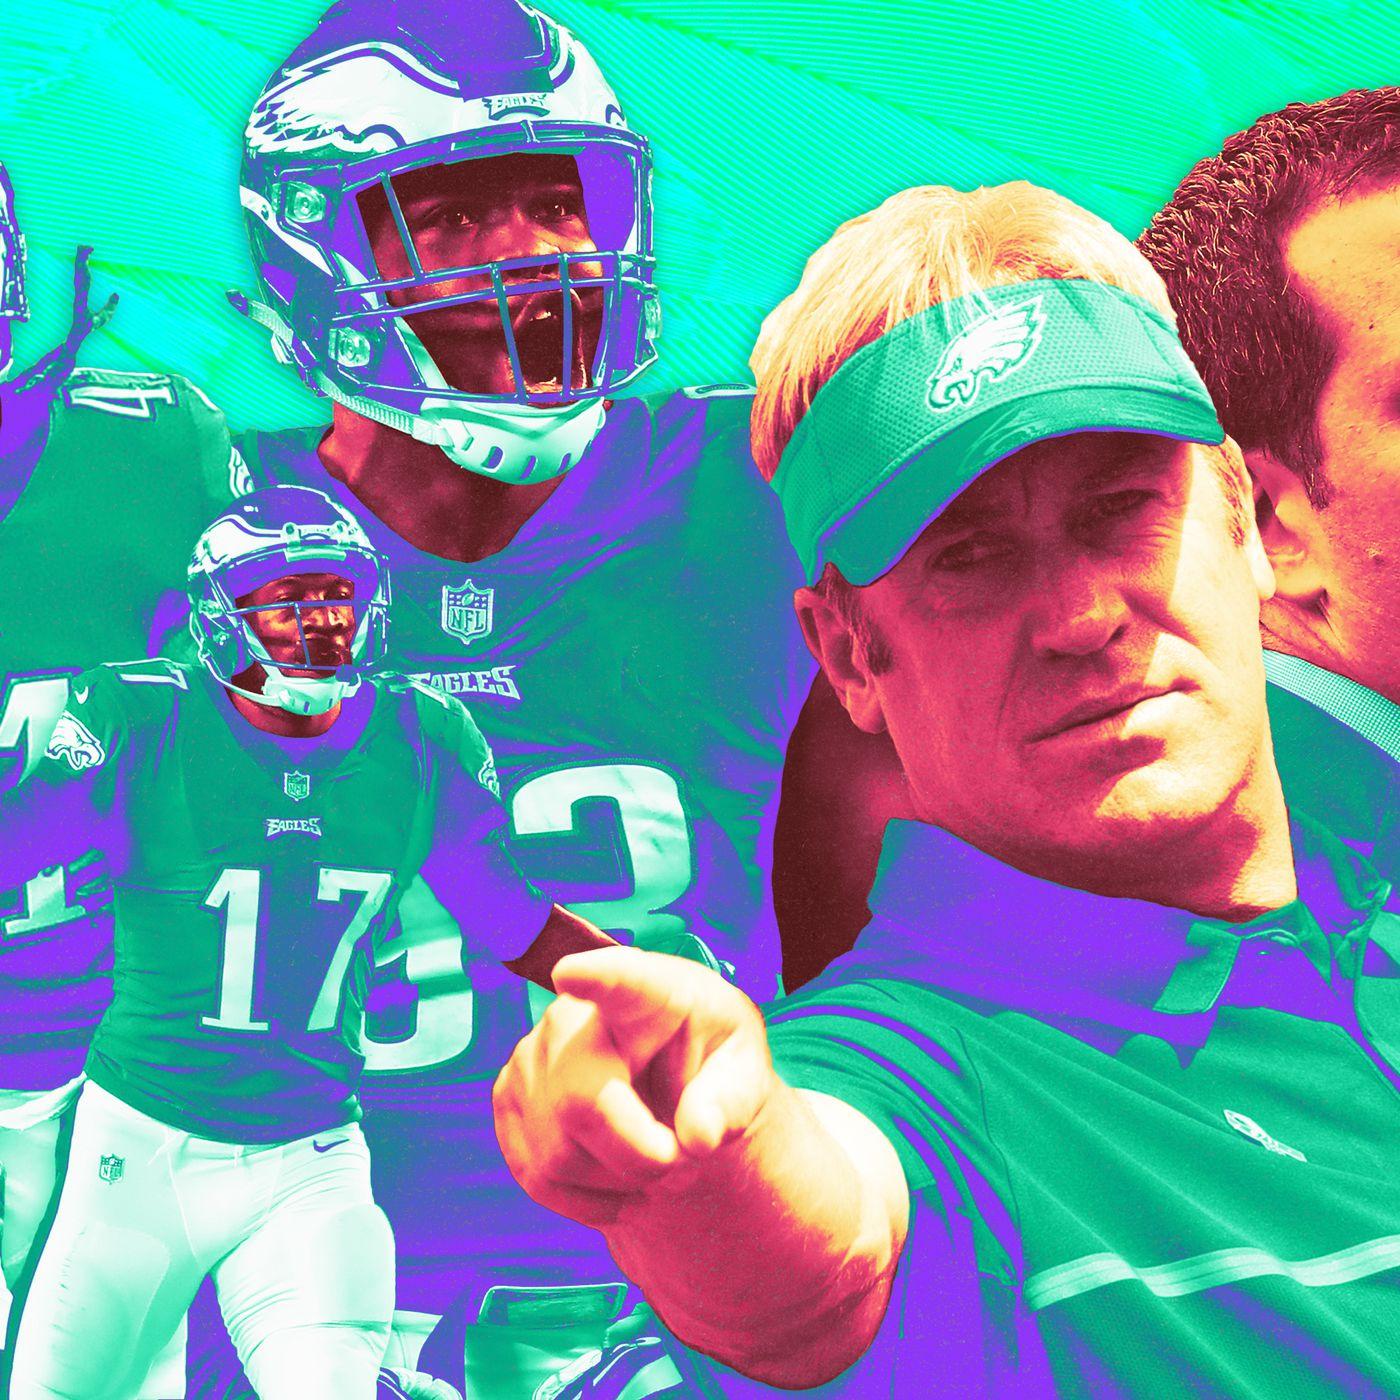 17ff61135dd Philadelphia's Football Revolution: How a Cultural Shift Explains the Eagles'  Rise